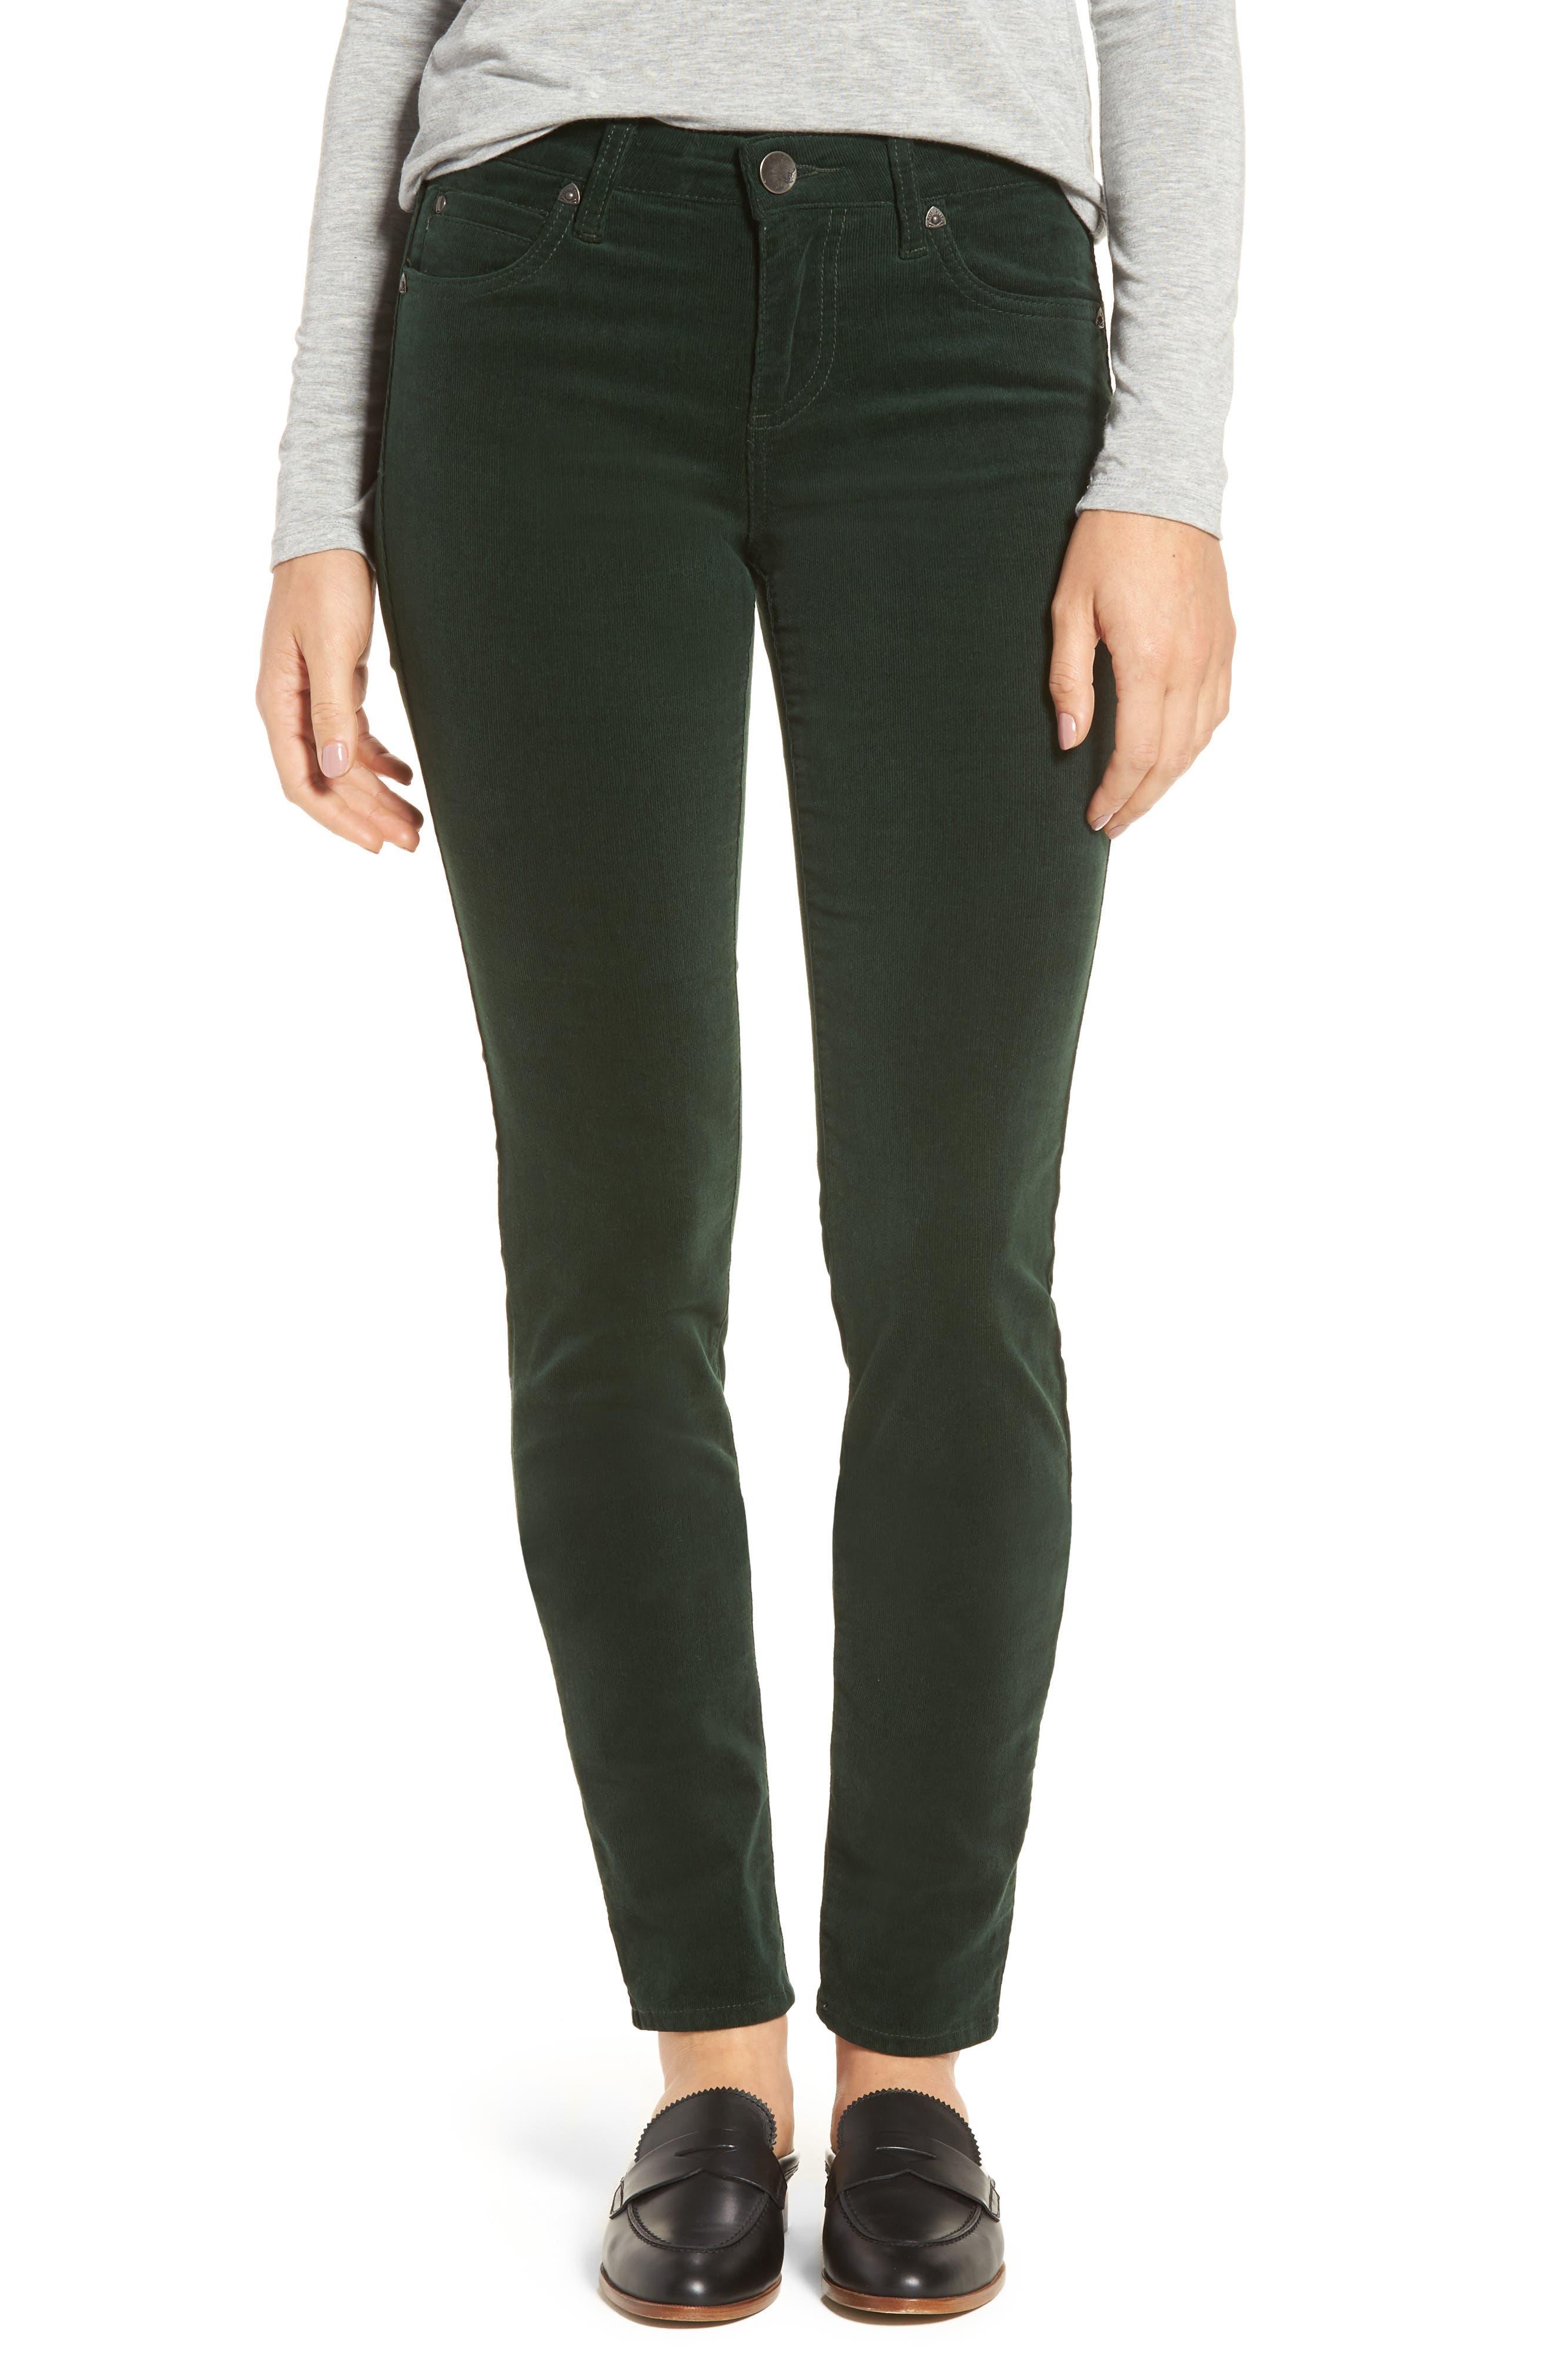 Main Image - KUT from the Kloth Diana Stretch Corduroy Skinny Pants (Regular & Petite)